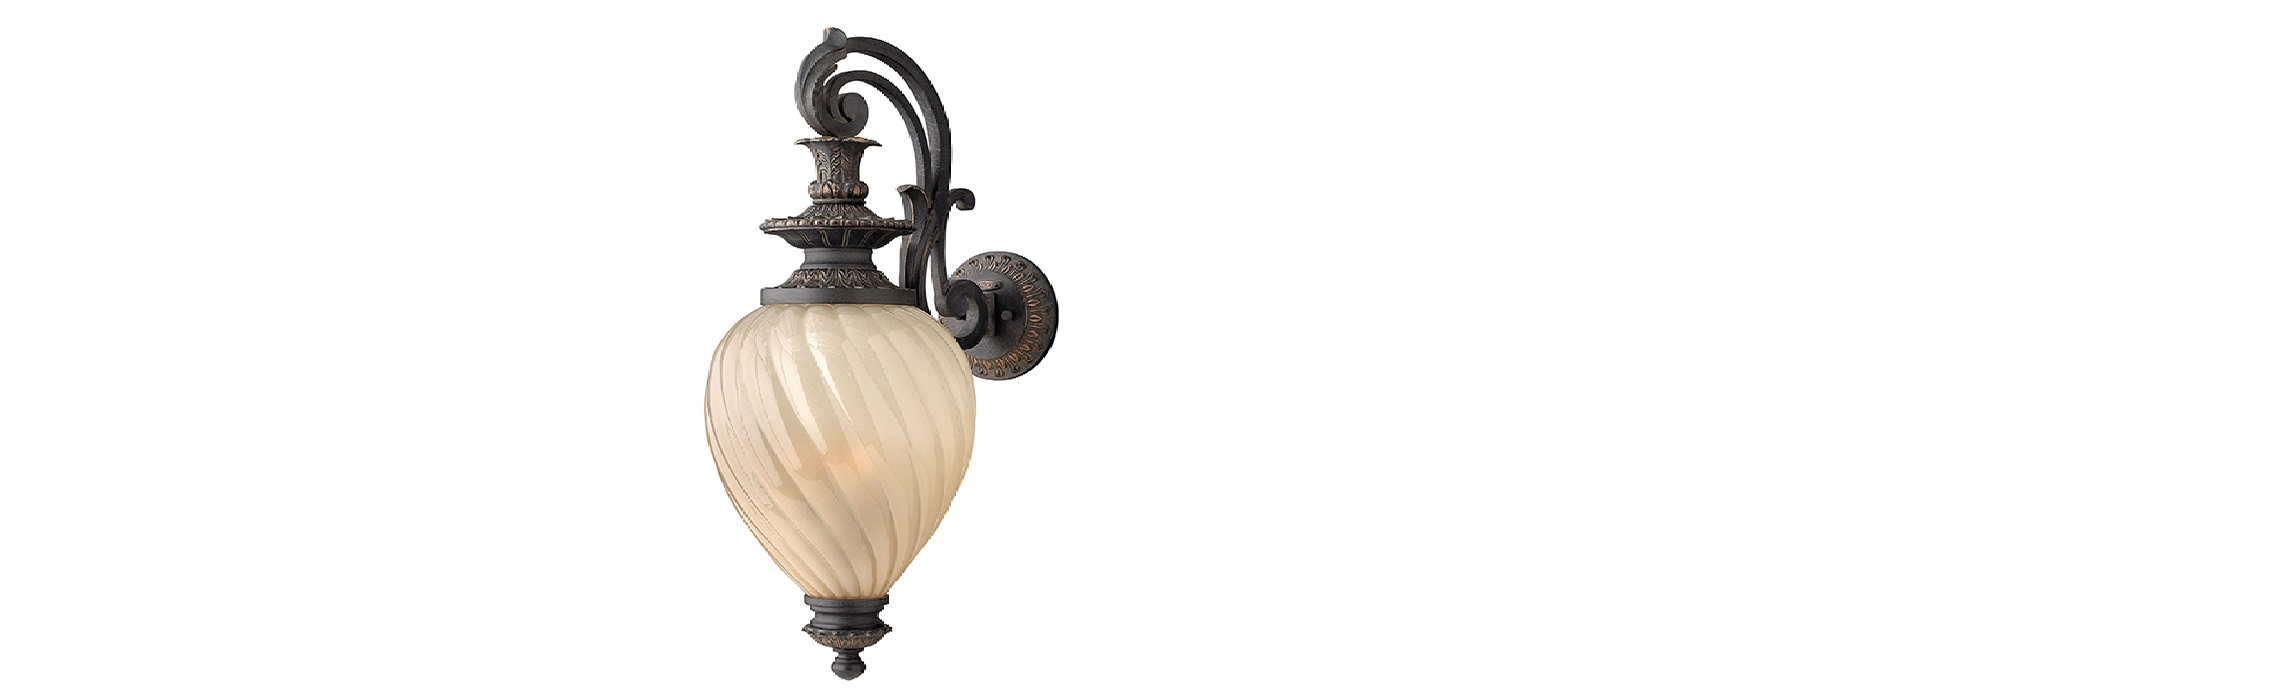 Настенный фонарь Hinkely LightingУличные настенные светильники<br>Цоколь: E14.&amp;amp;nbsp;&amp;lt;div&amp;gt;Мощность: 60W.&amp;amp;nbsp;&amp;lt;/div&amp;gt;&amp;lt;div&amp;gt;Количество ламп: 3.&amp;amp;nbsp;&amp;lt;/div&amp;gt;&amp;lt;div&amp;gt;Цвет: состаренное железо.&amp;lt;/div&amp;gt;<br><br>Material: Металл<br>Length см: None<br>Width см: 27,9<br>Height см: 81,3